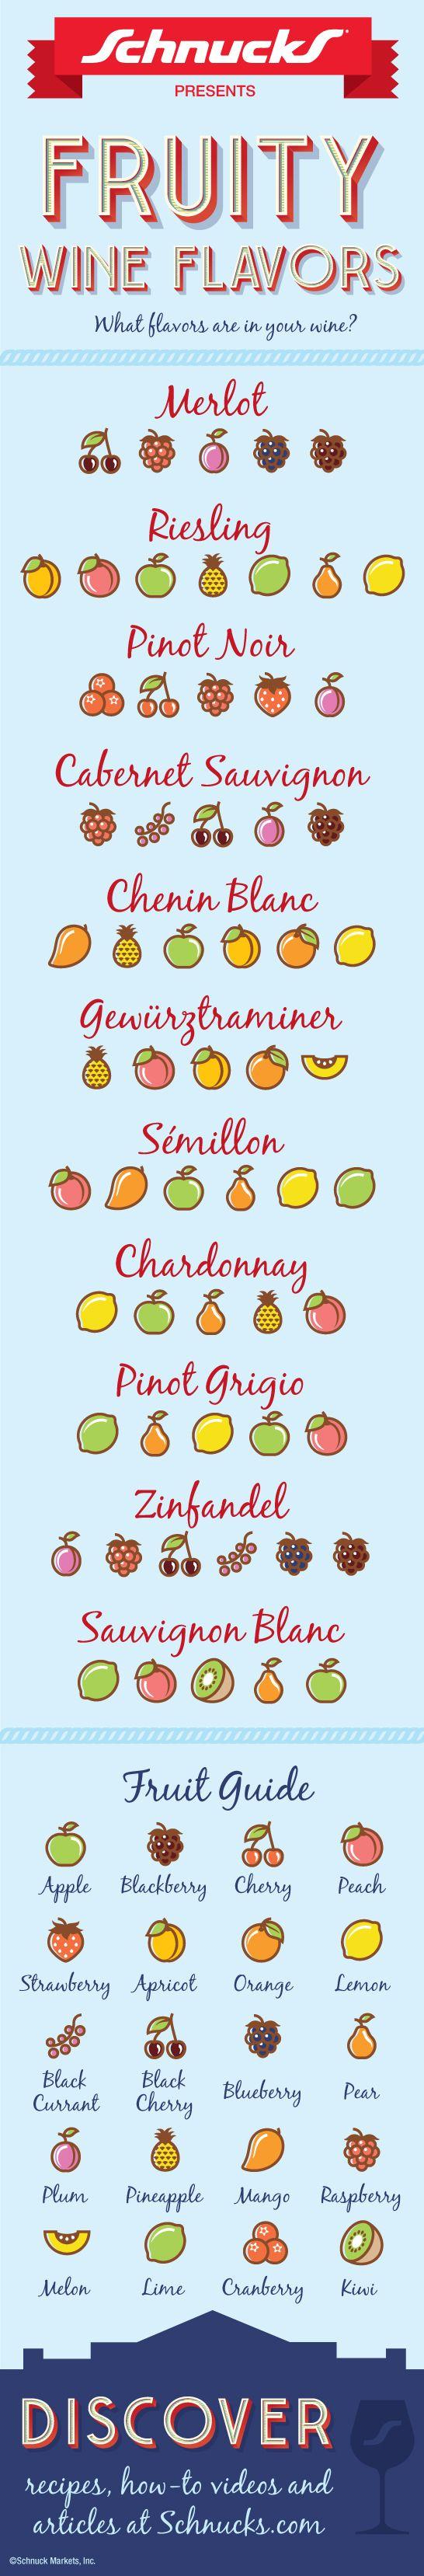 Fruity Wine Flavors #infographic #infografía